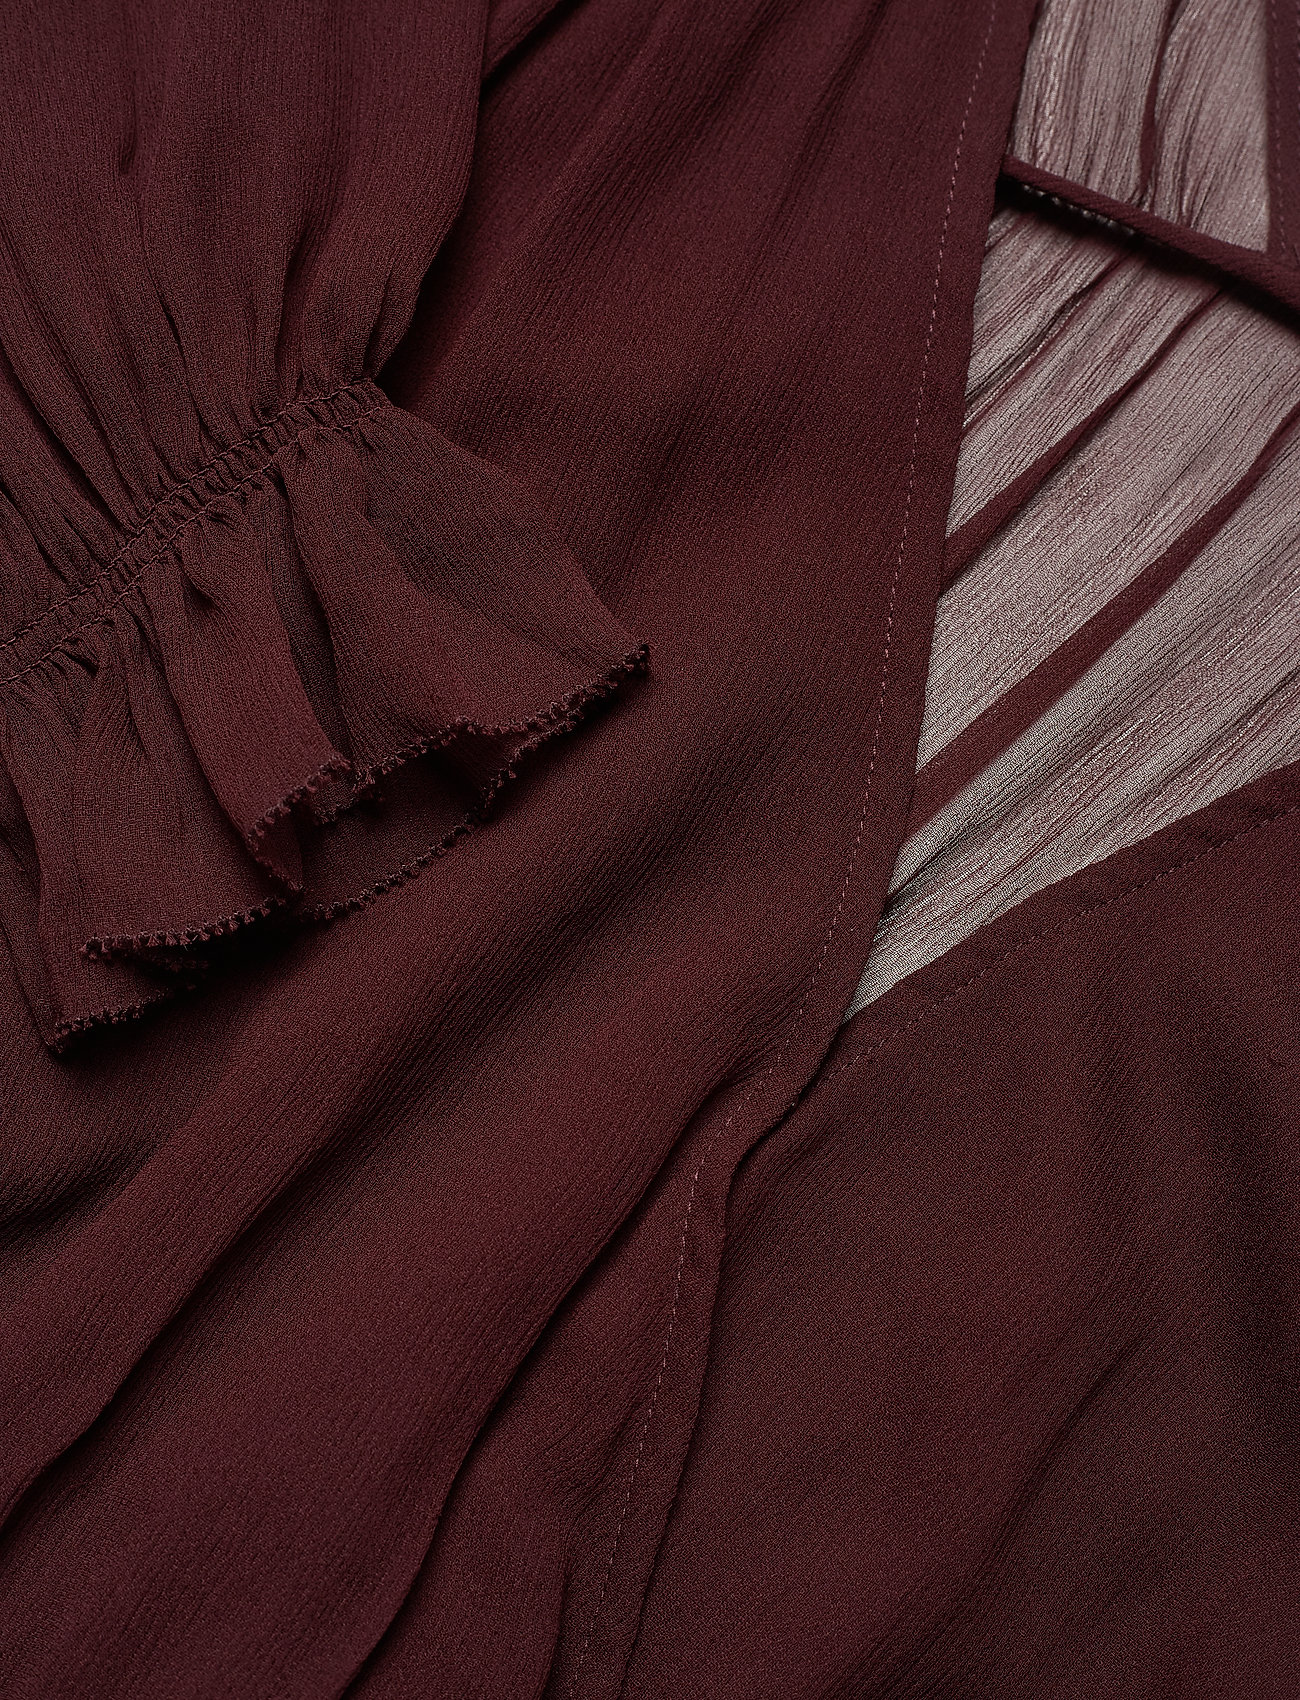 Mindy Ruffle Dress (Rouge Noir) (1452 kr) - DESIGNERS, REMIX